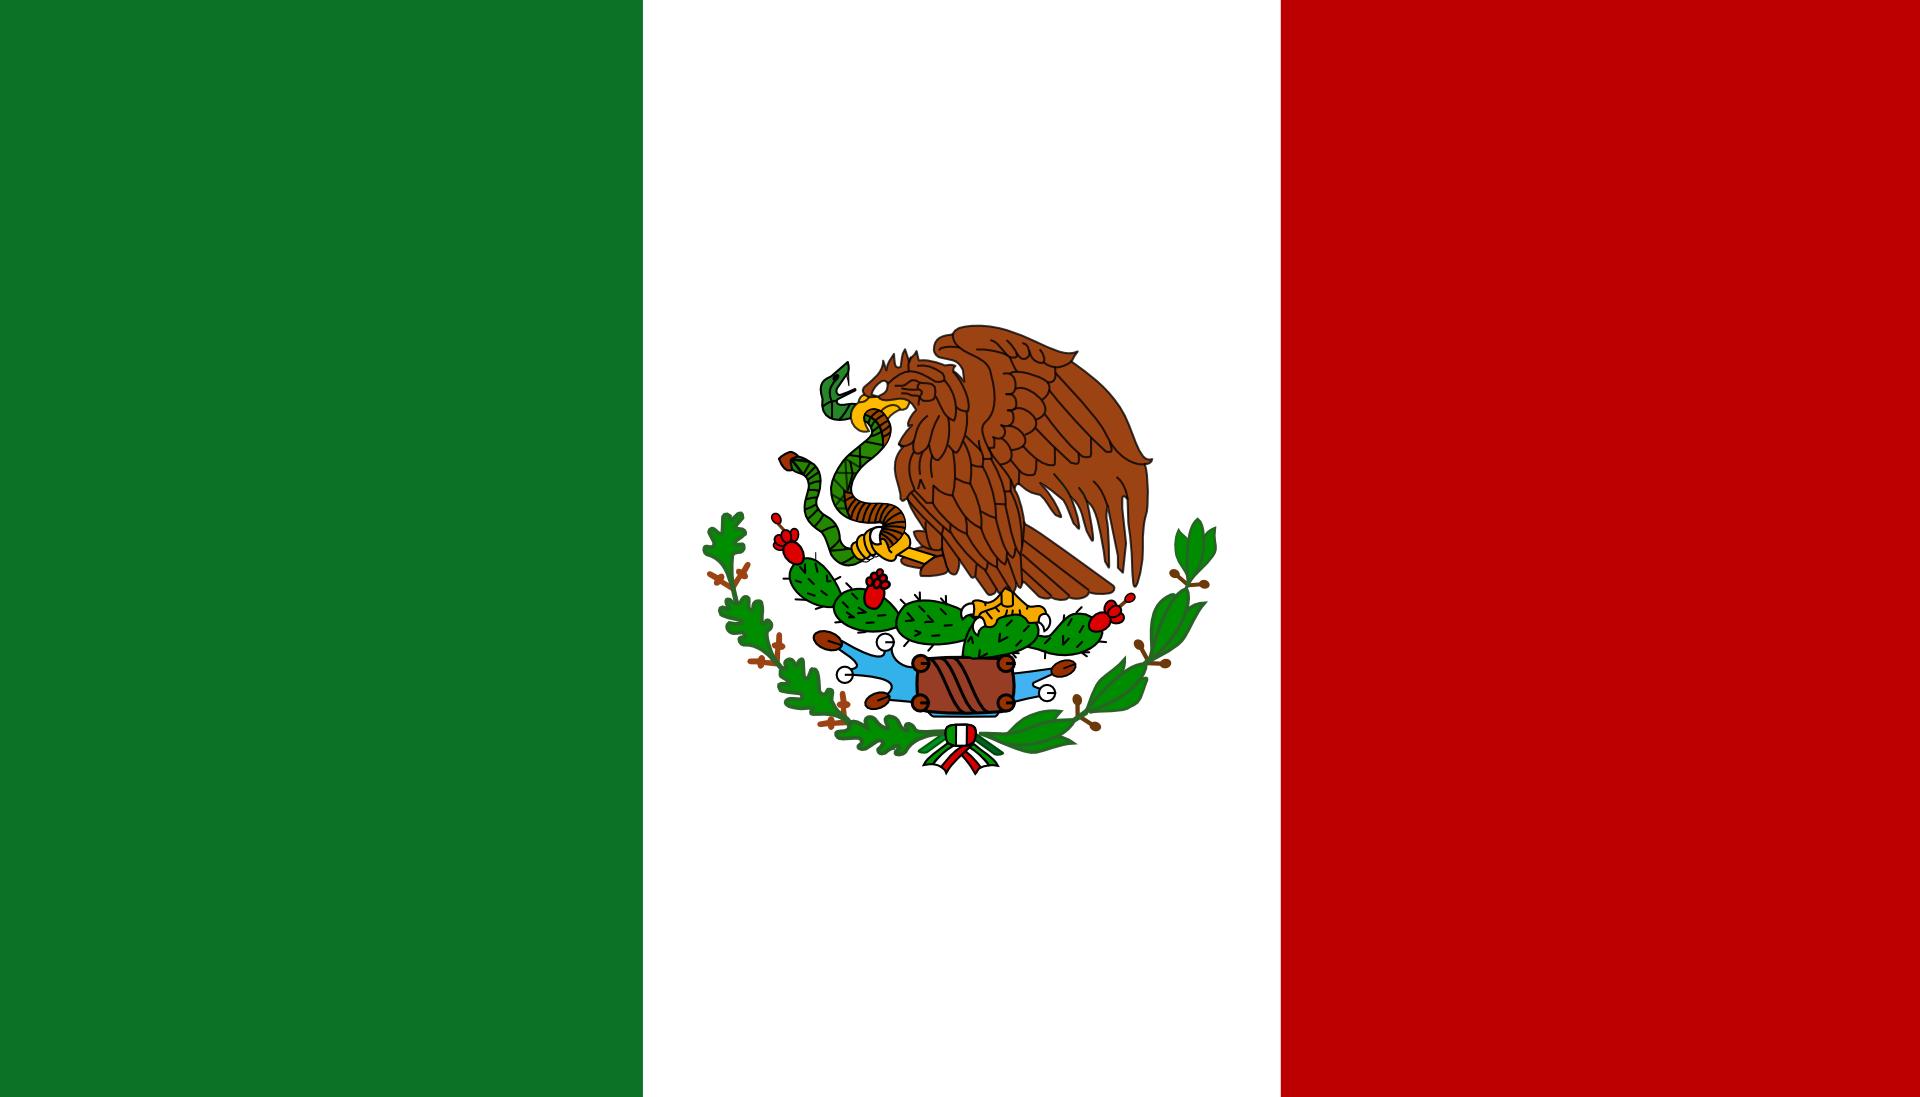 Mexico Aztec Symbols Mexican Flags Mexico Flag